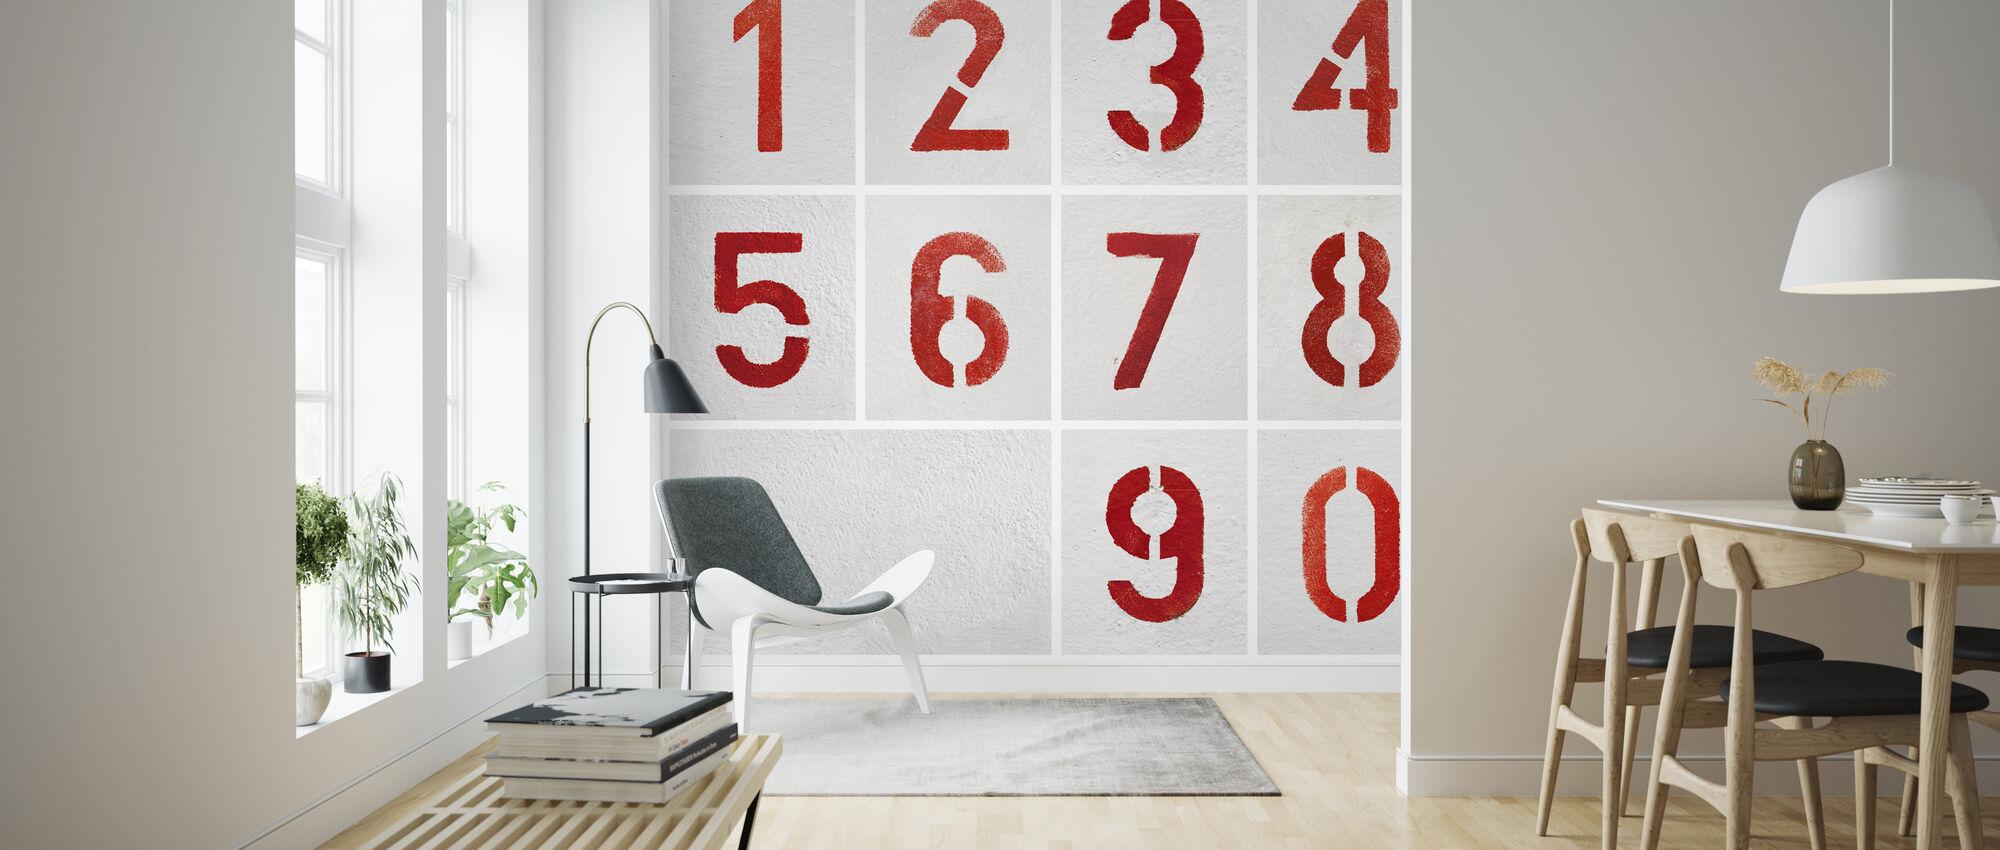 Numbers Painted Stencils - Wallpaper - Living Room